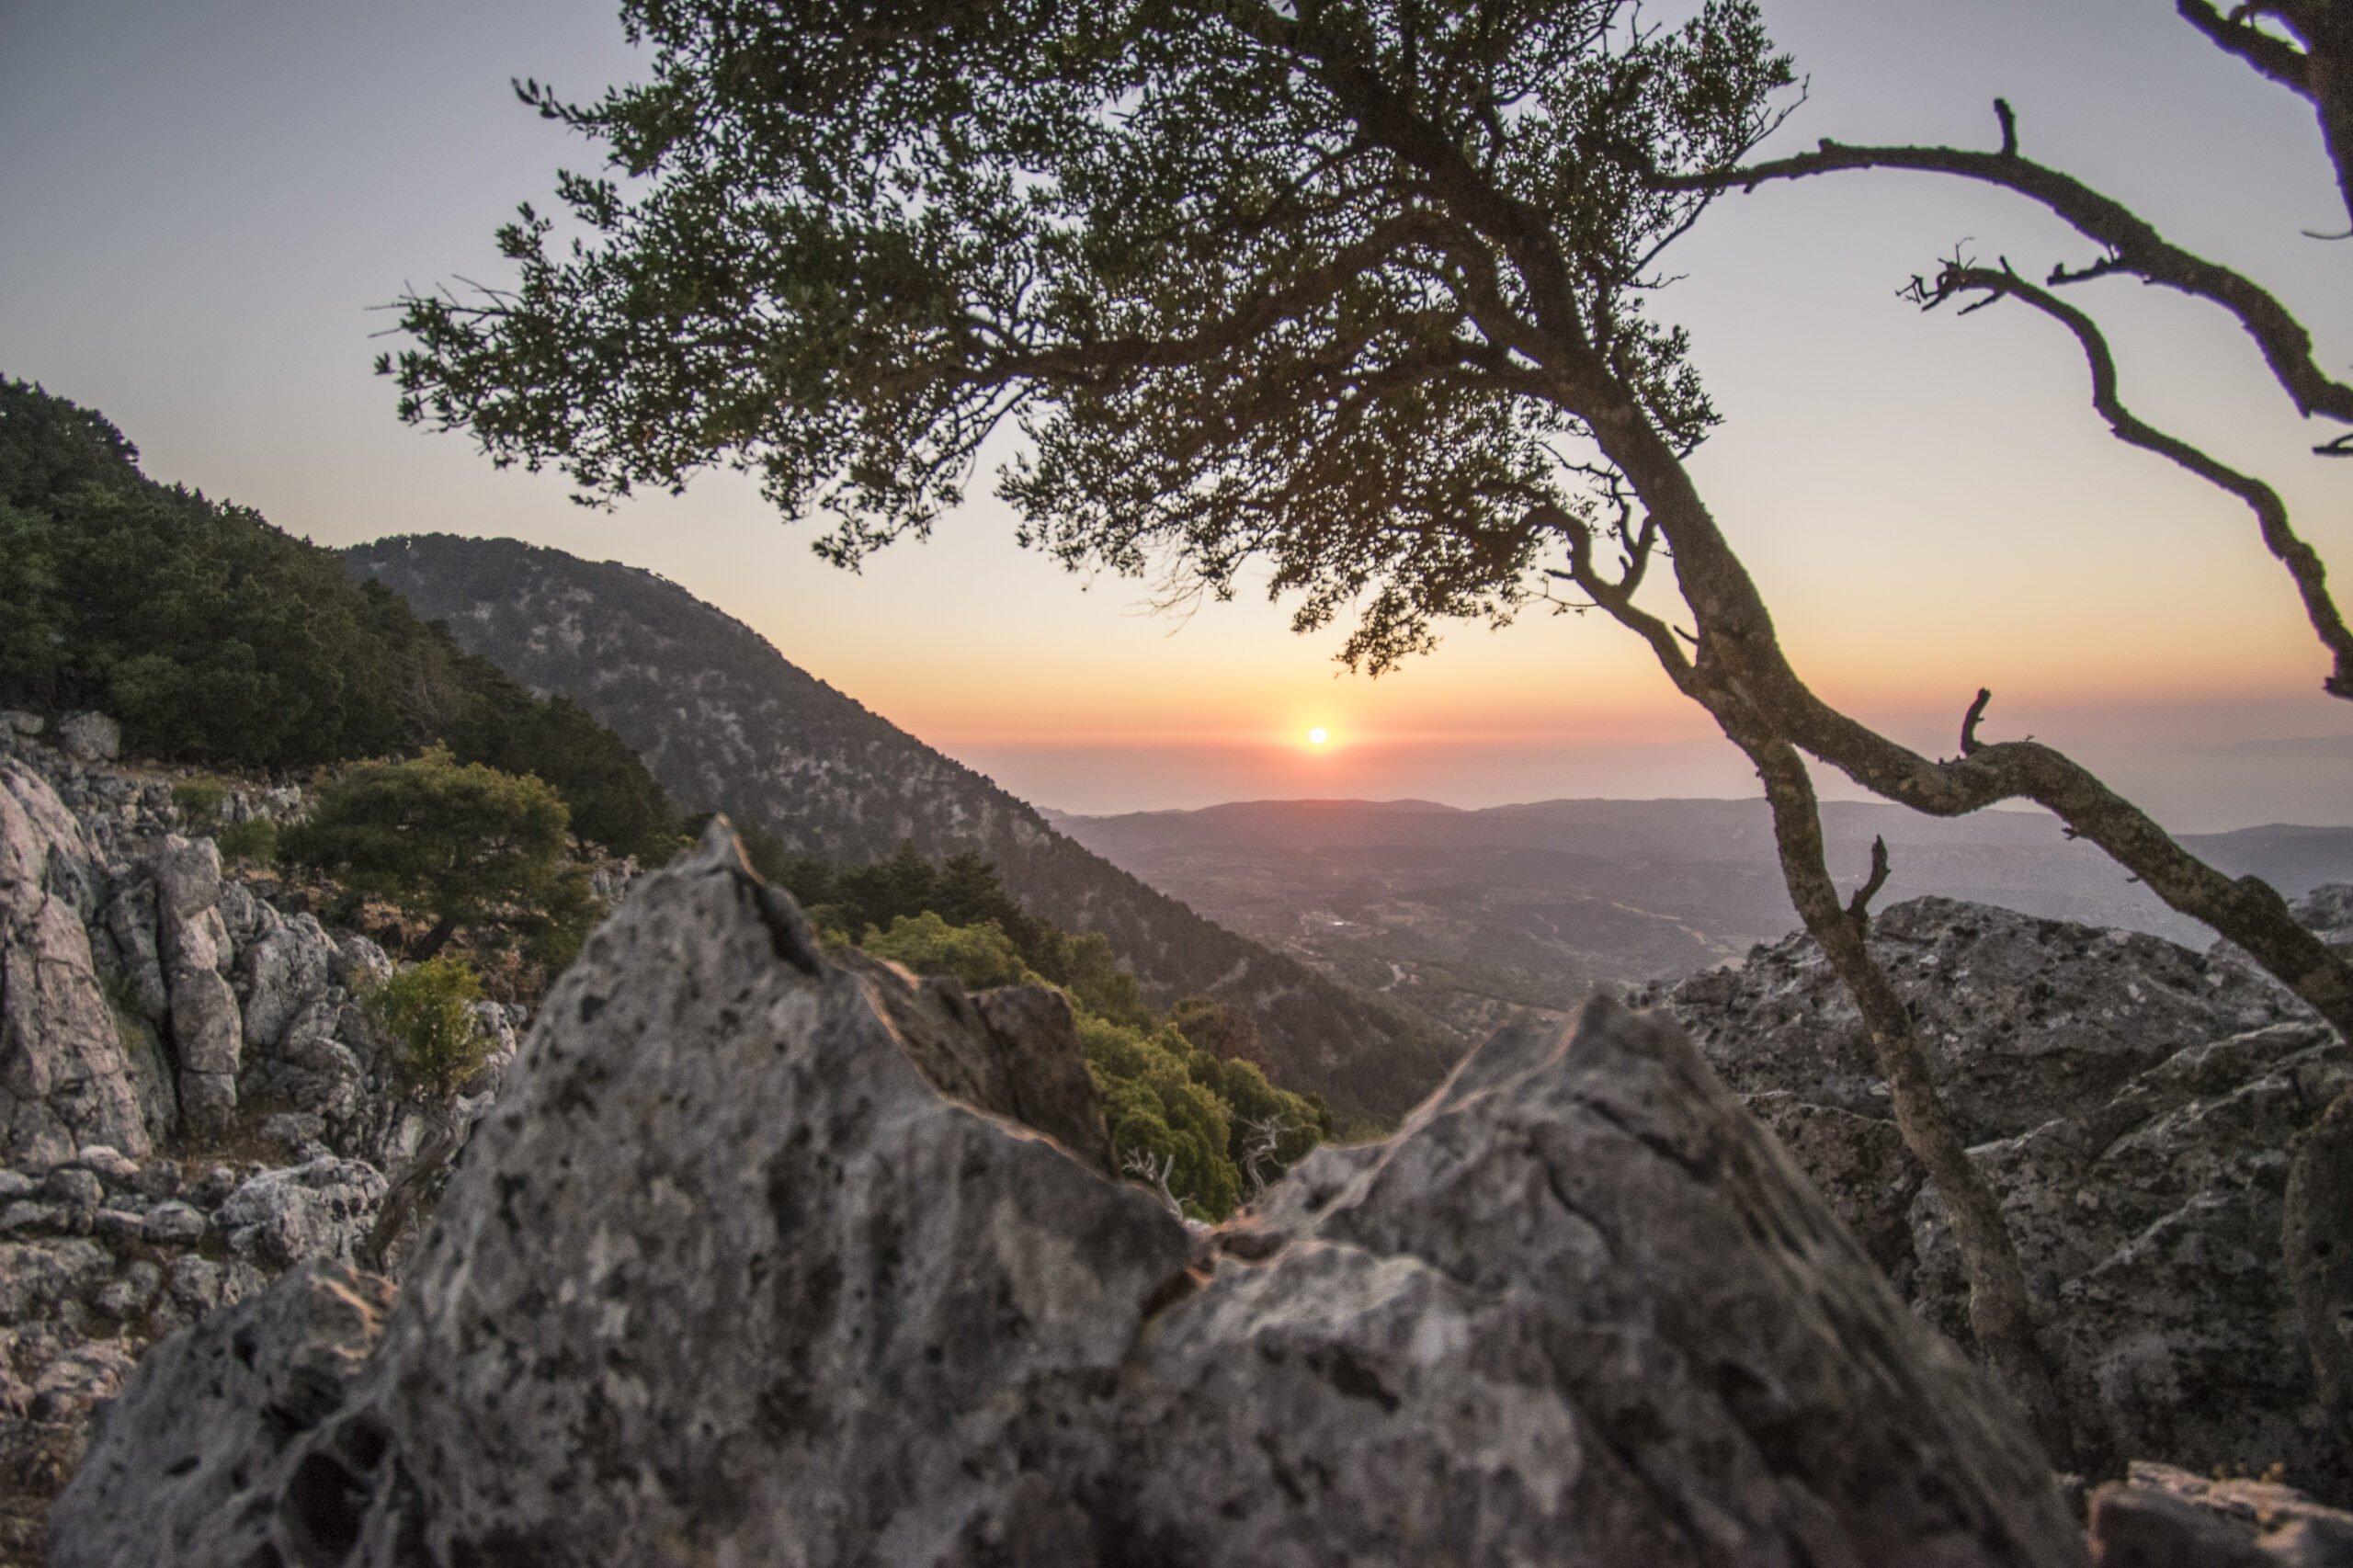 Enjoy The Beautiful Sunsut In Our Profitis Ilias Sunset Hiking Tour